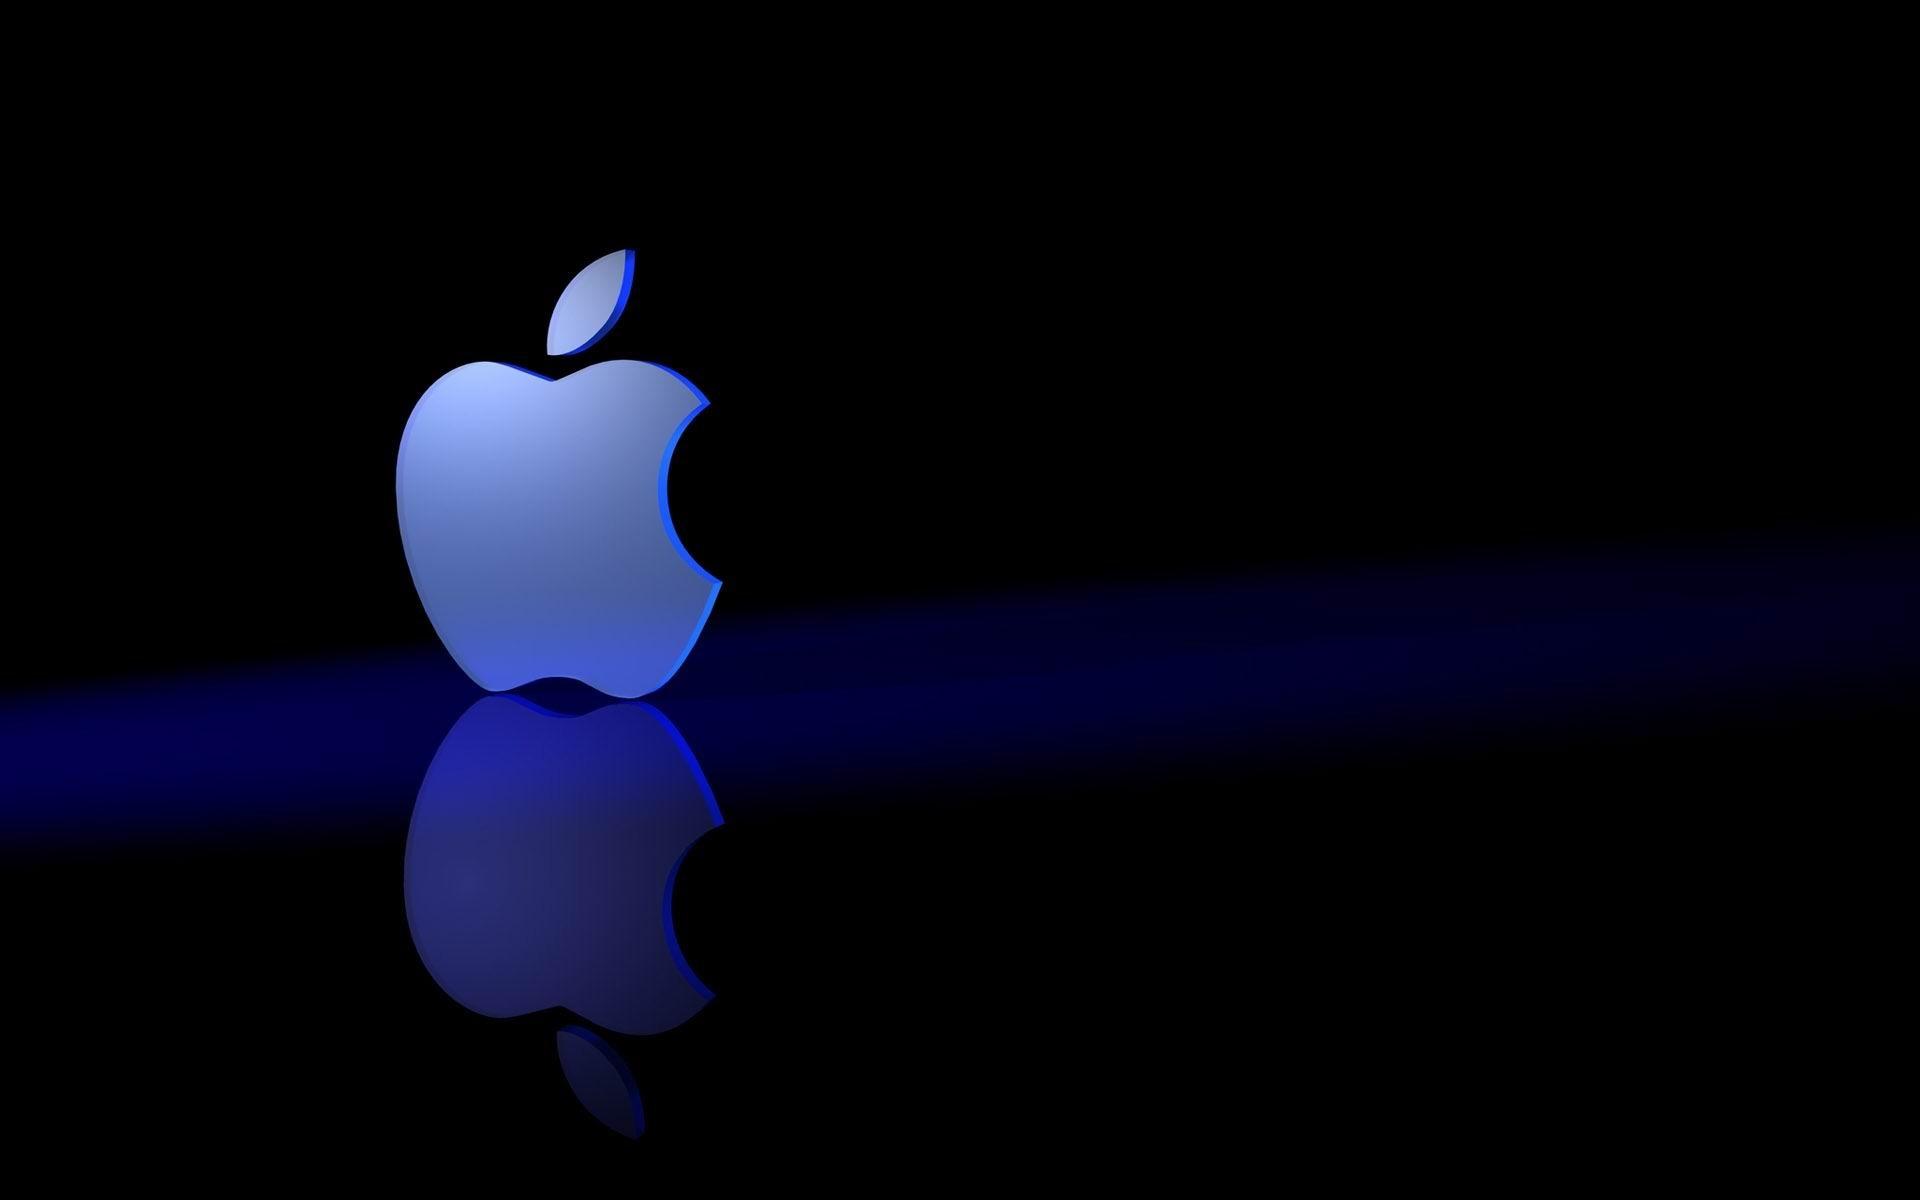 Appleロゴブルー ブランド広告の壁紙プレビュー 10wallpaper Com